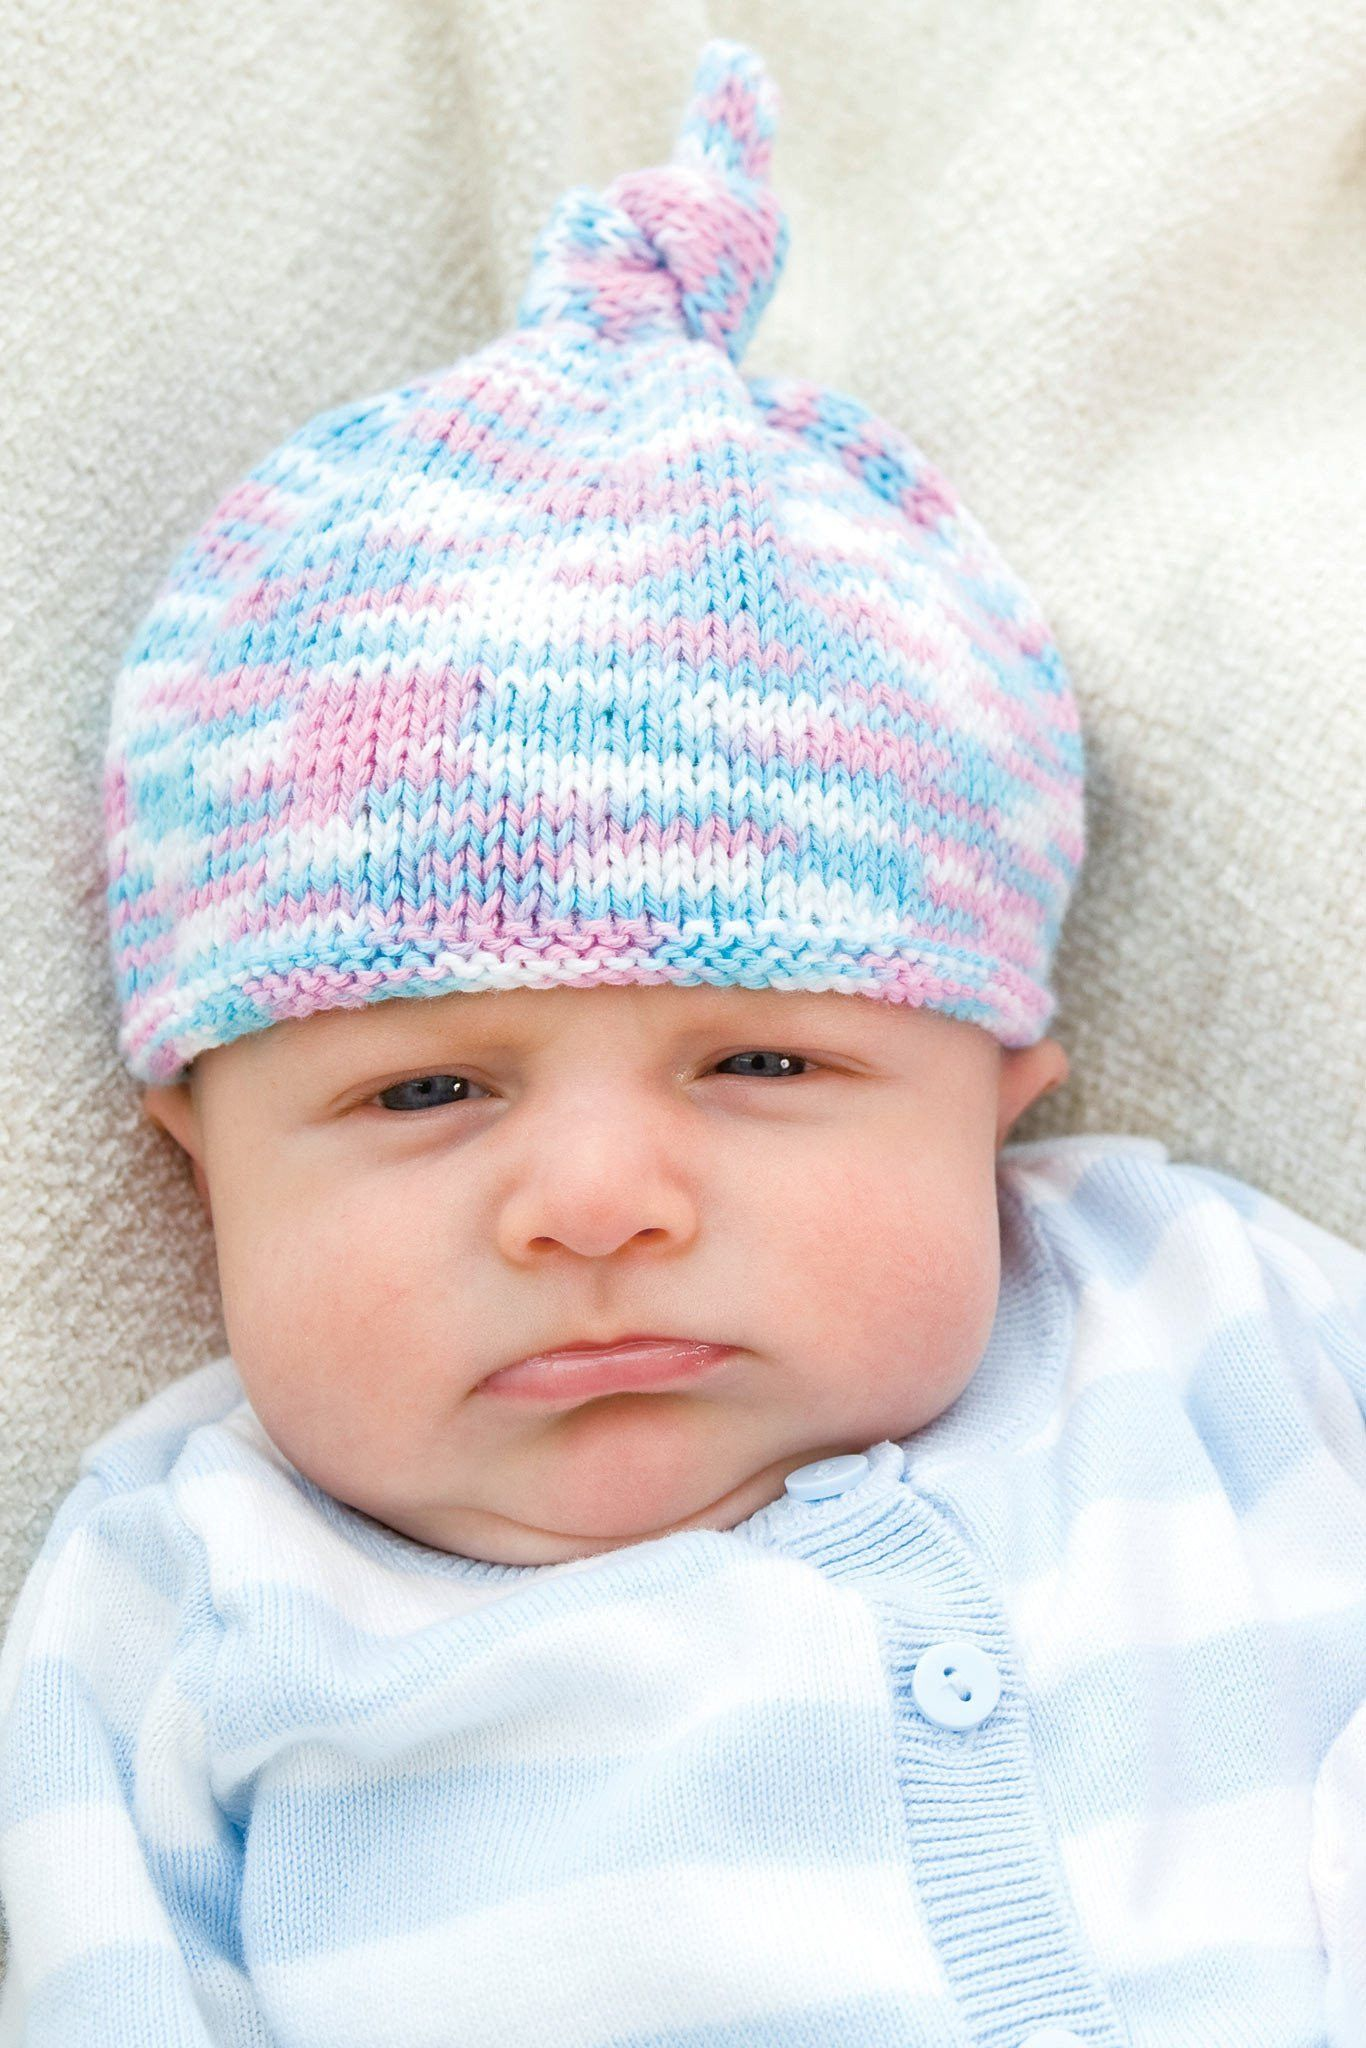 Baby Beanie Hat Knitting Pattern | The Knitting Network